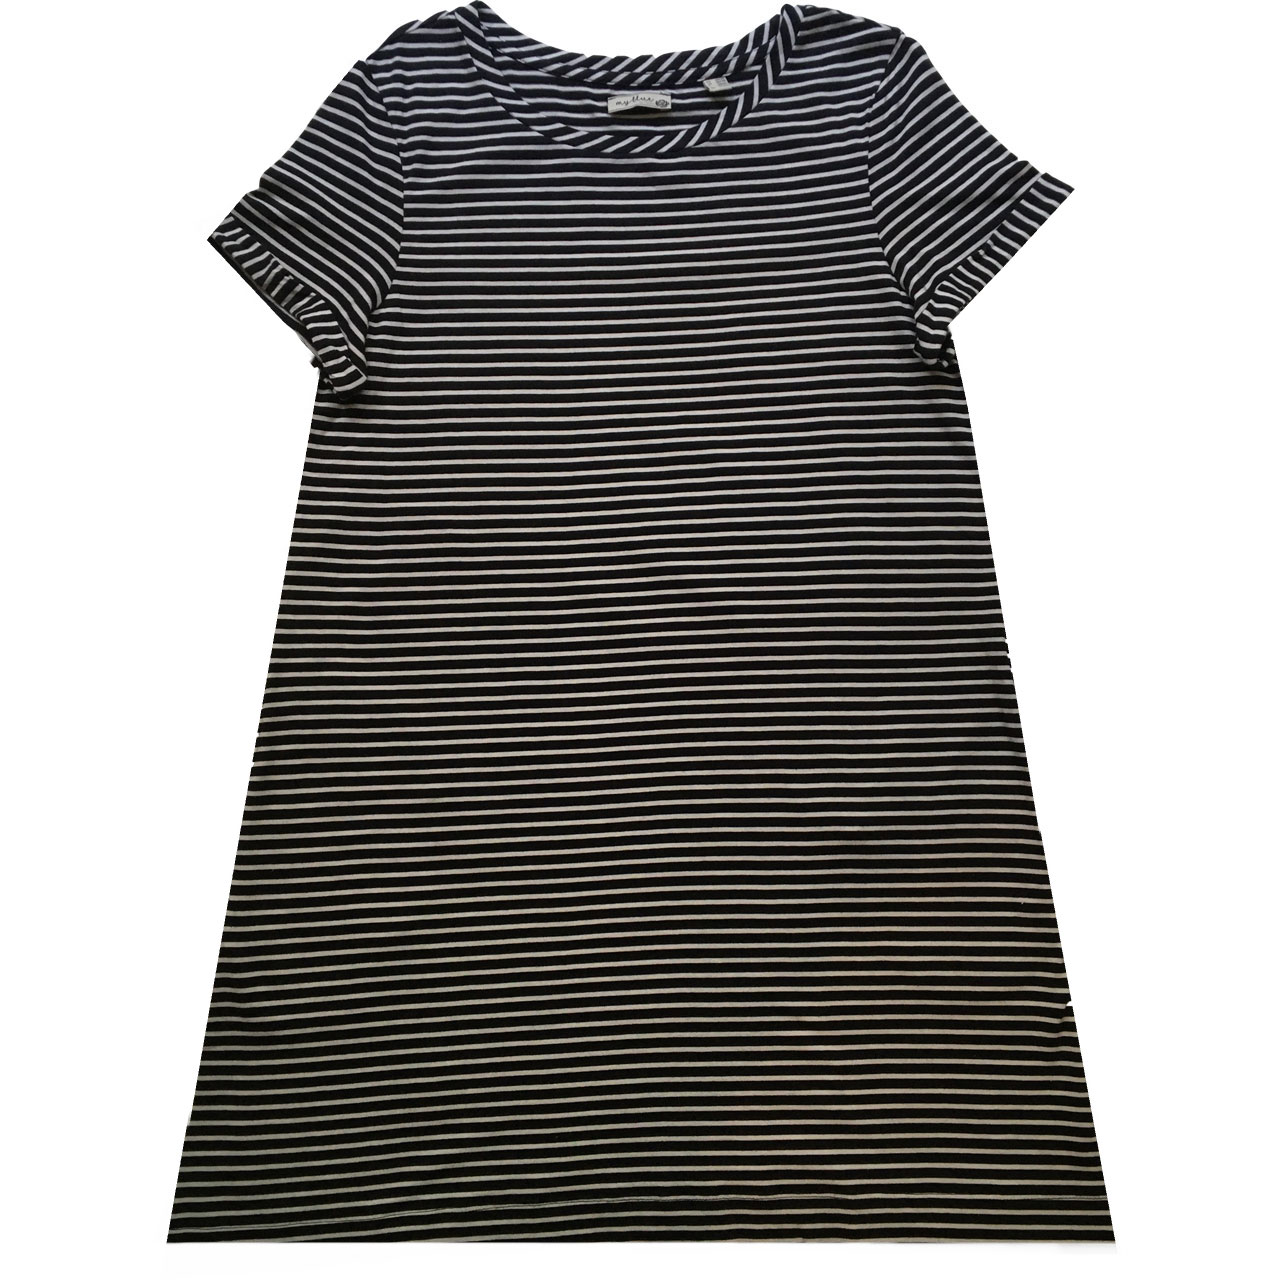 پیراهن زنانه چیبو کد V7710